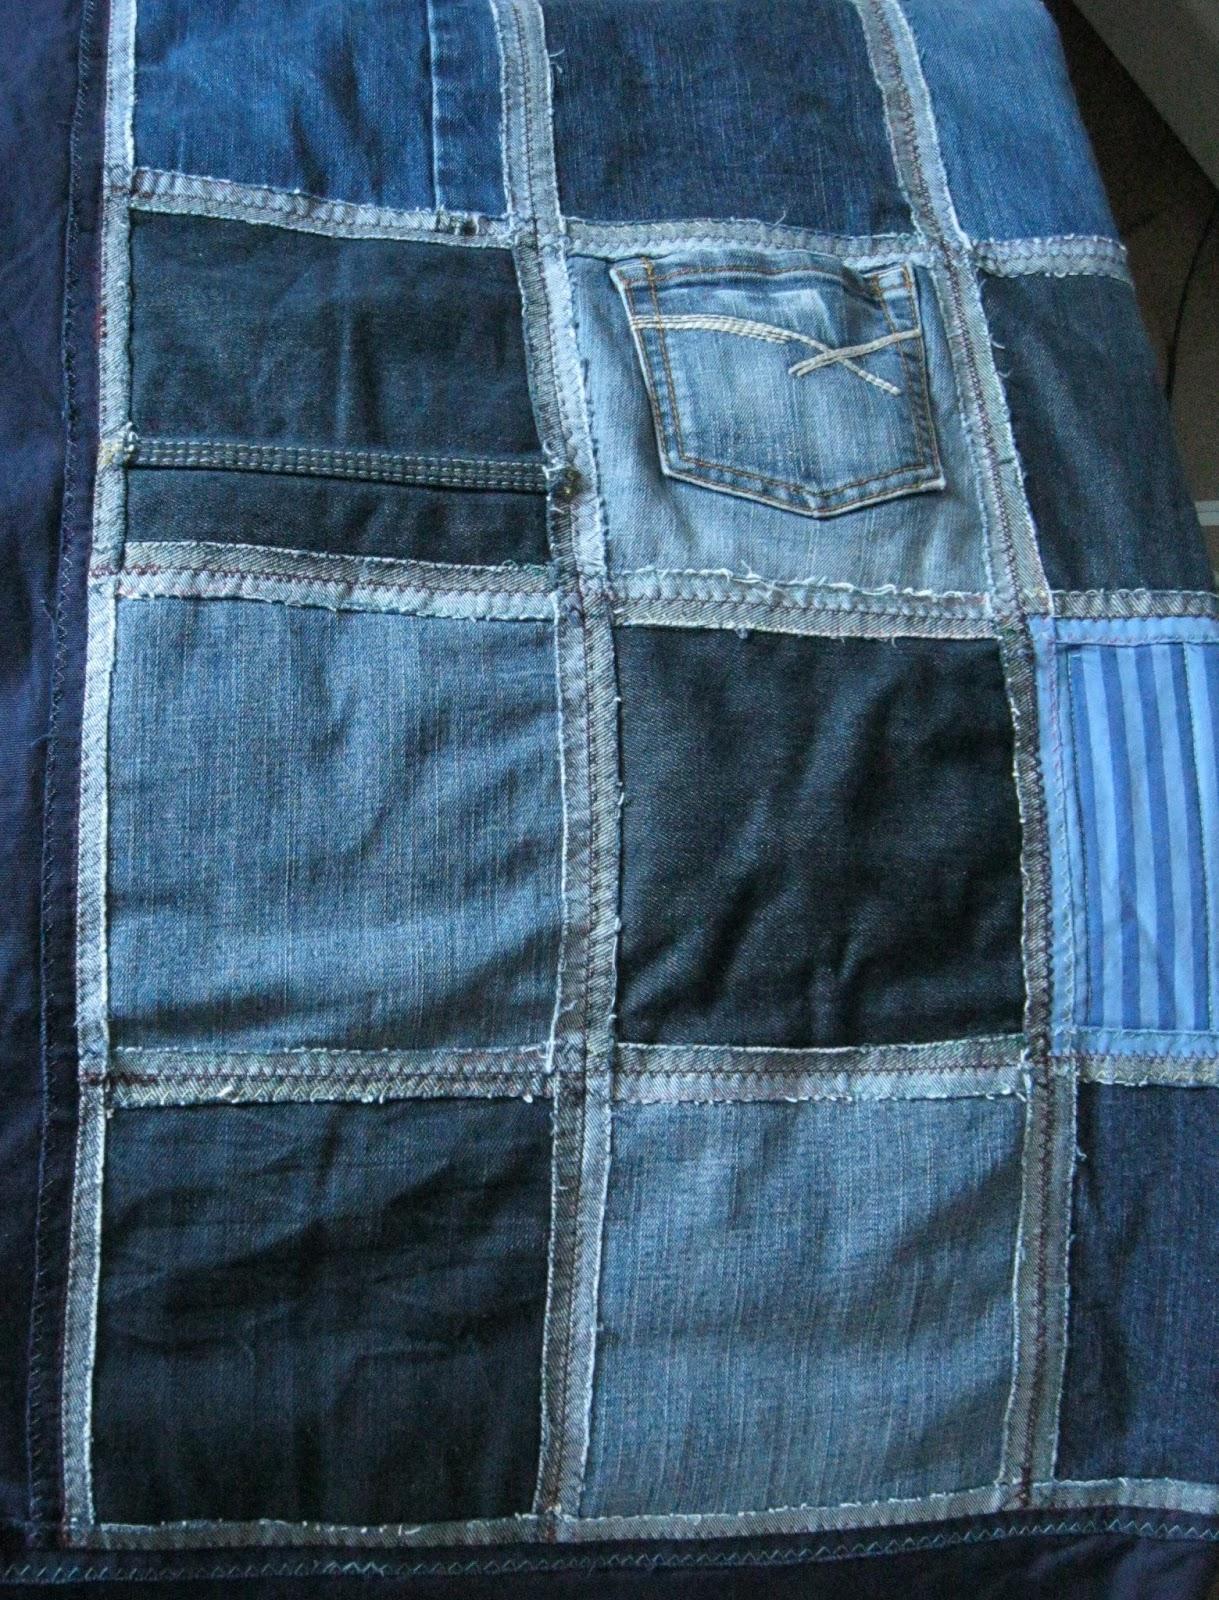 wellness an der n hmaschine patchworkdecke aus jeanshosen aus alt mach nochmal neu. Black Bedroom Furniture Sets. Home Design Ideas